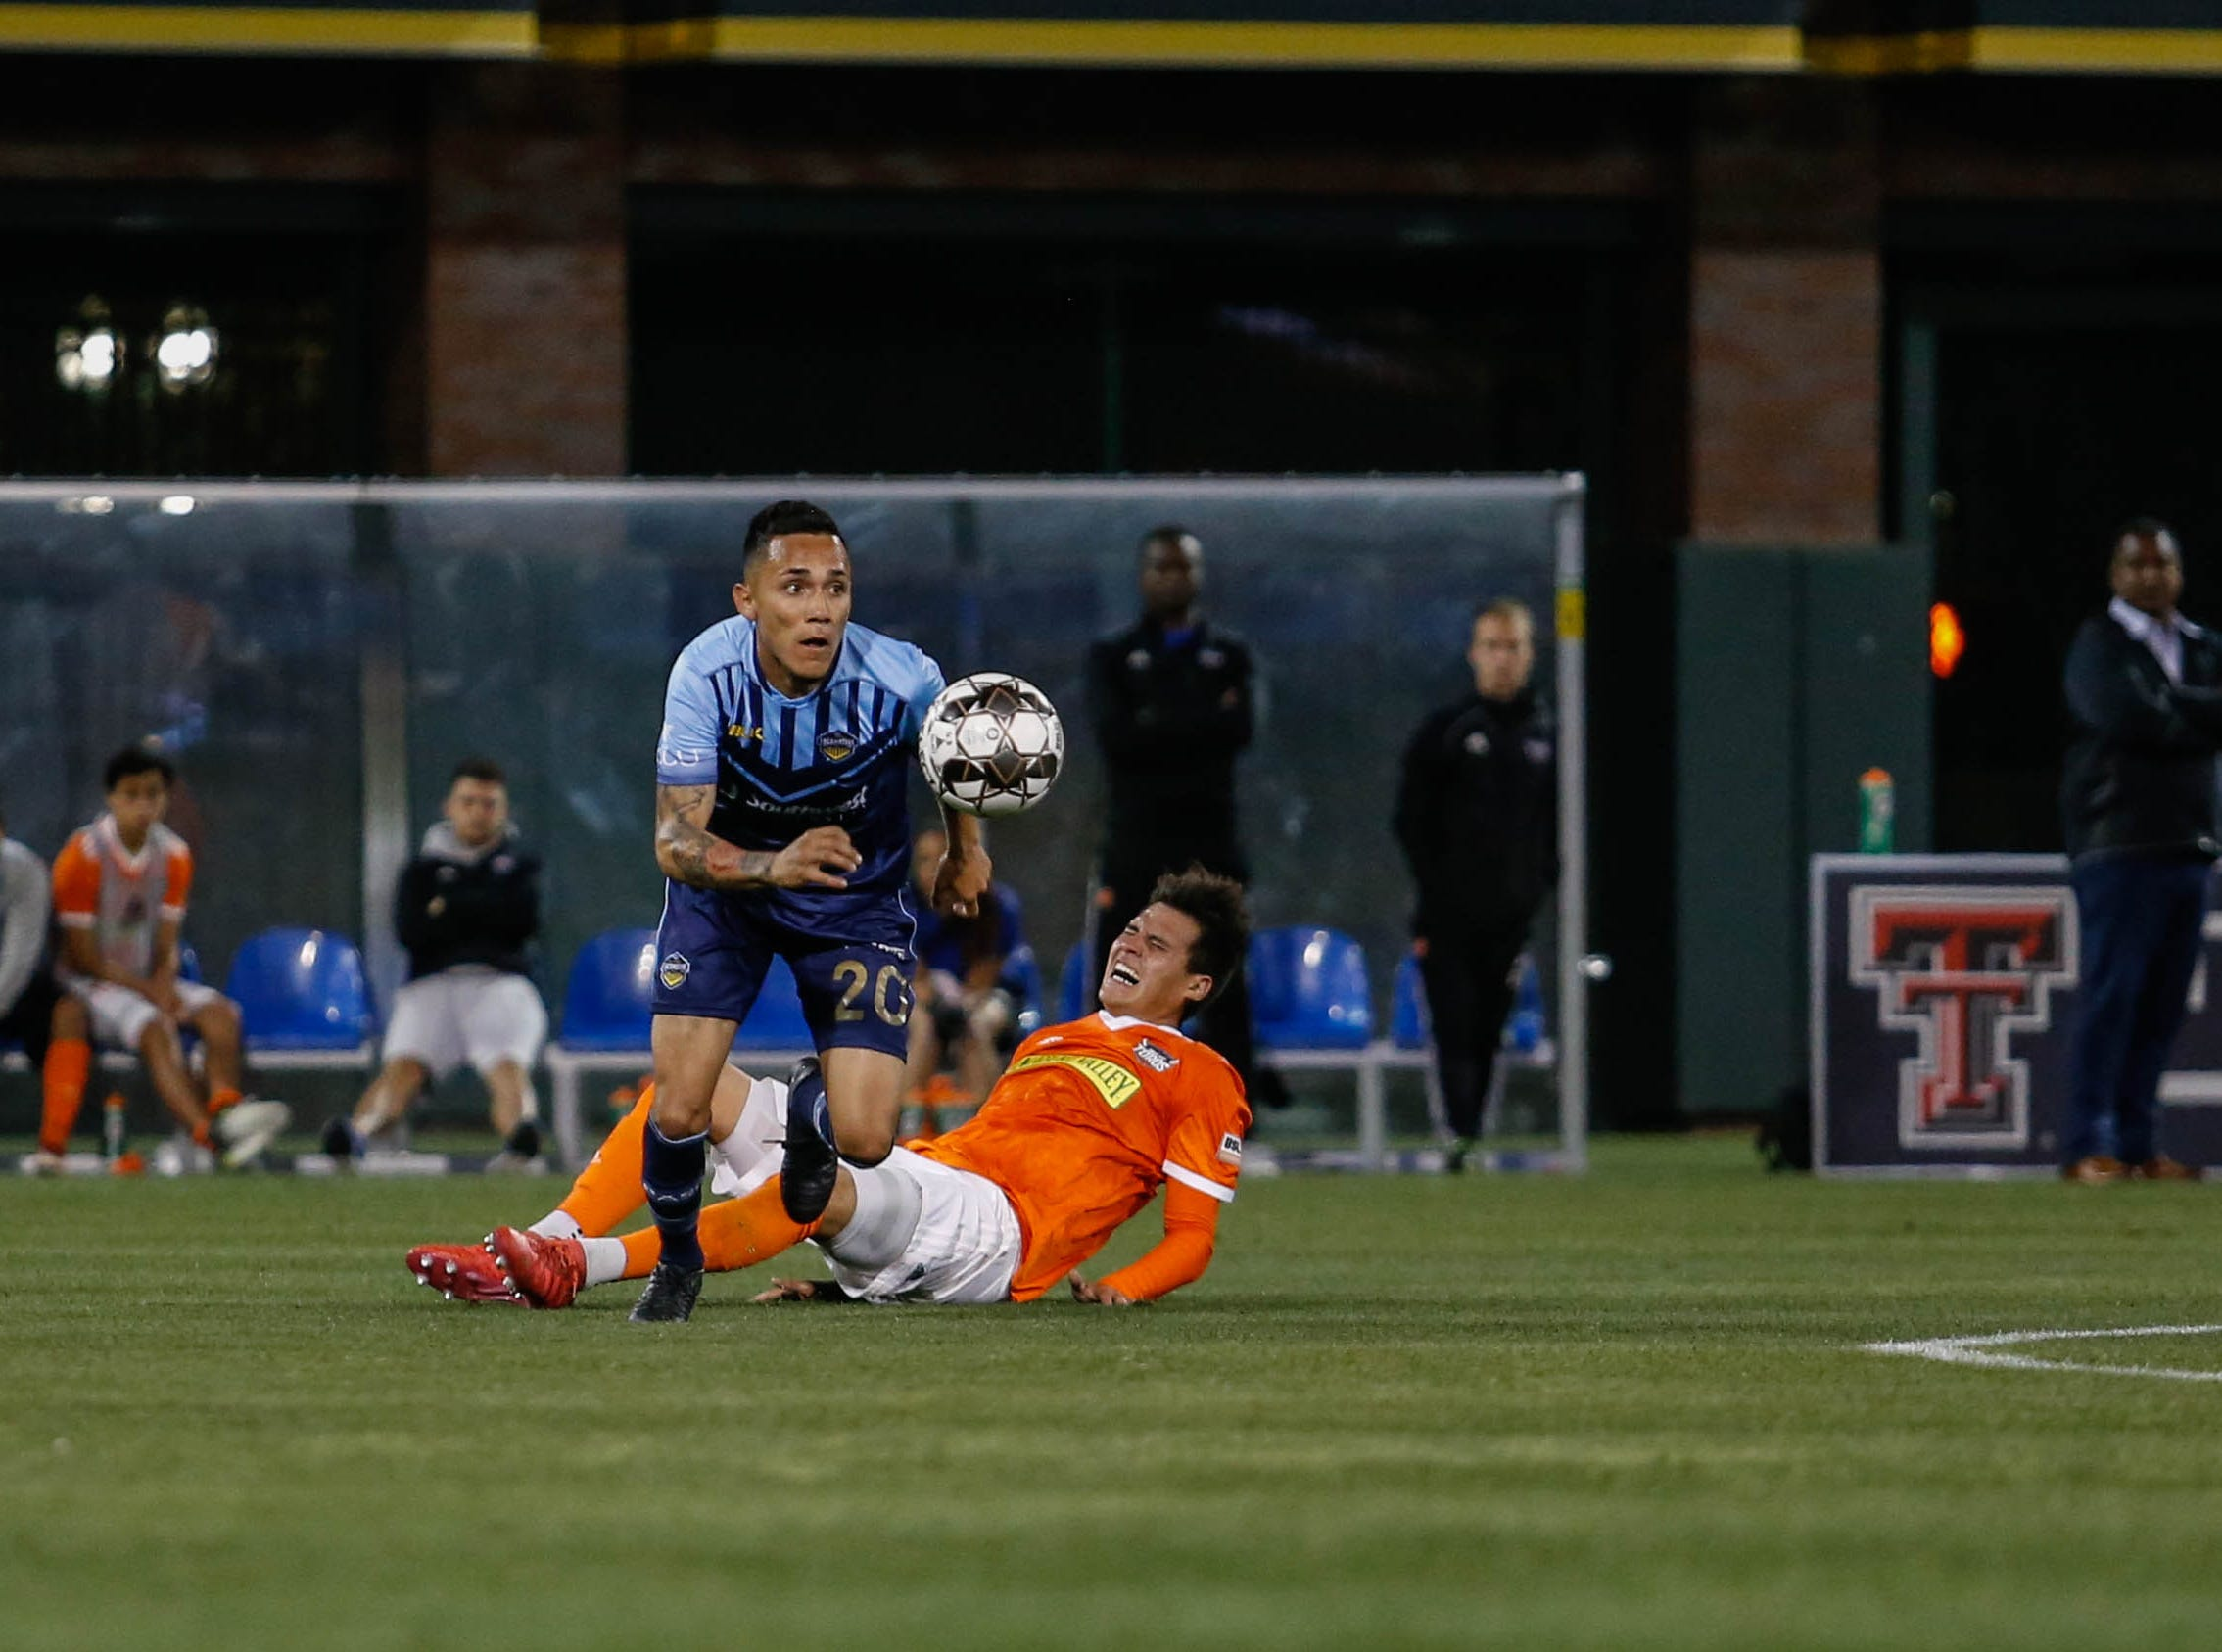 El Paso Locomotive midfielder Louis 'Chapa' Herrera pushes the ball forward.